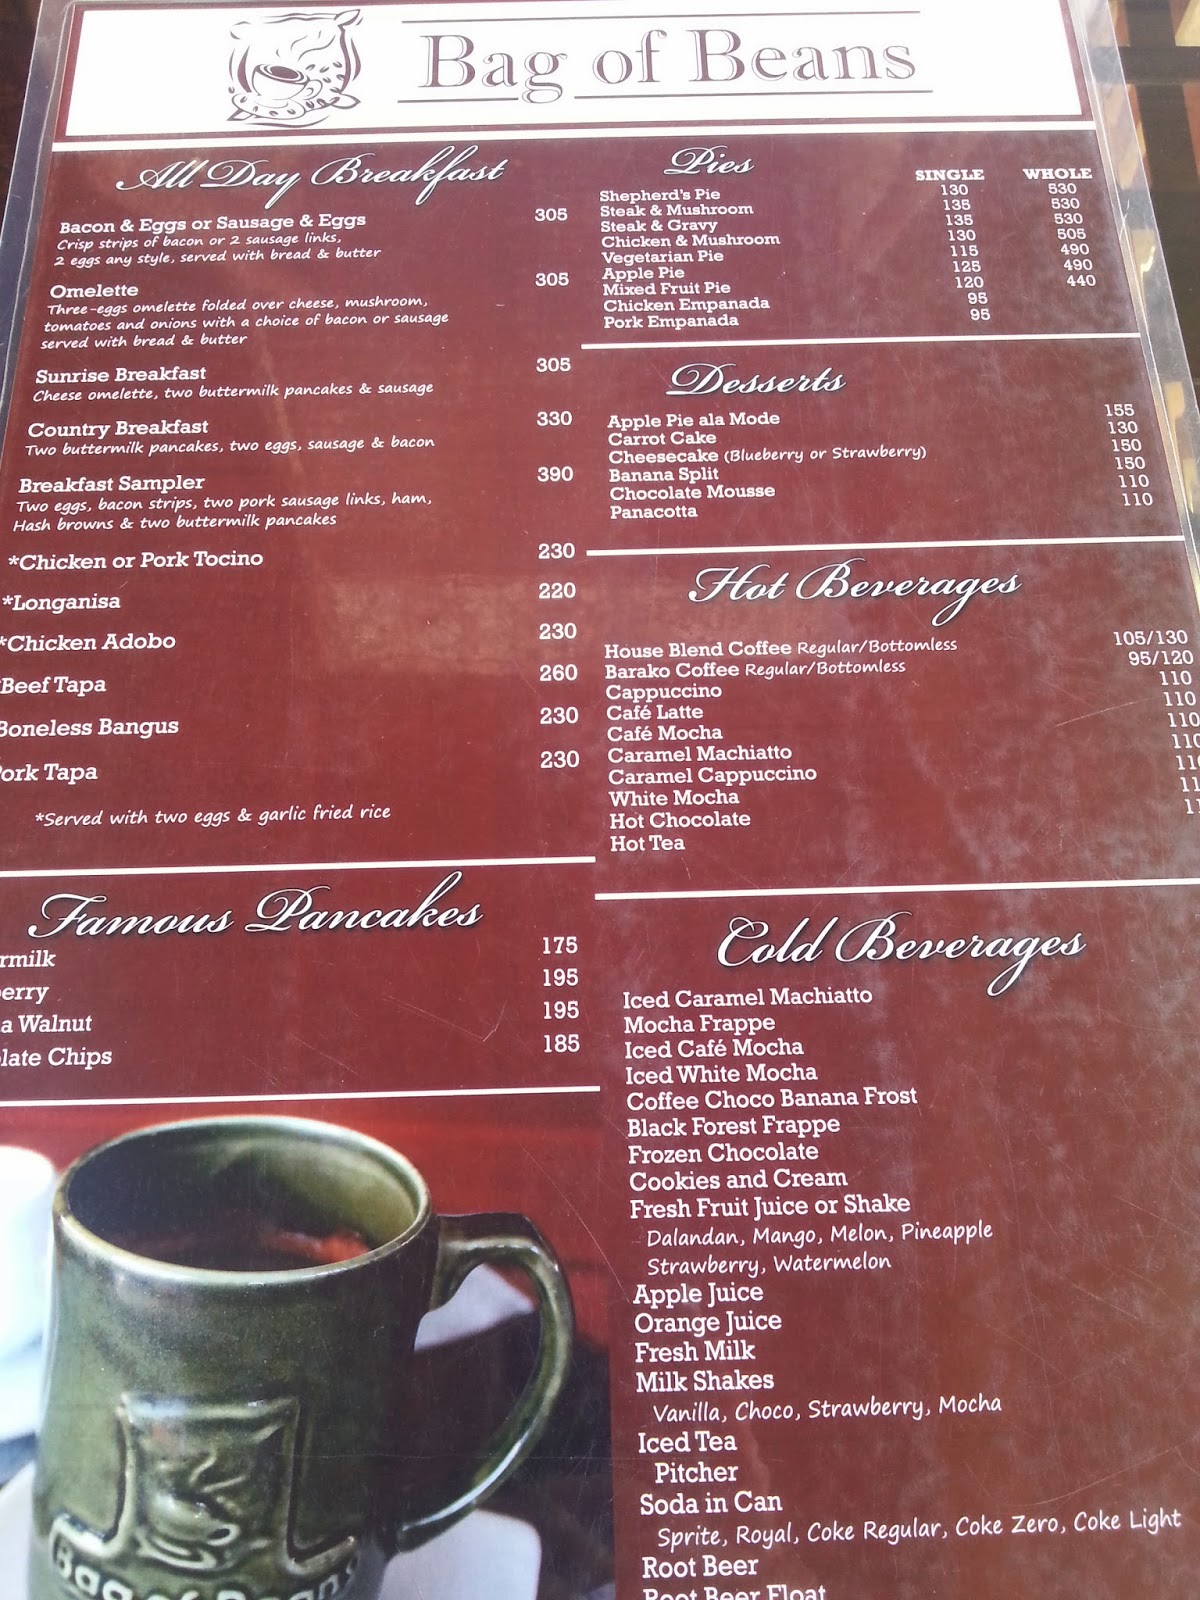 Cafe Veranda Tagaytay Buffet Price